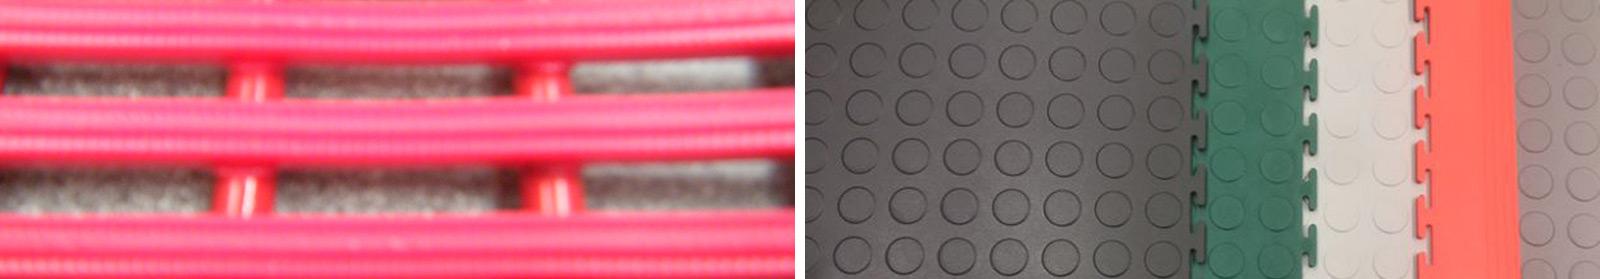 PVC Matting & Interlocking Tiles